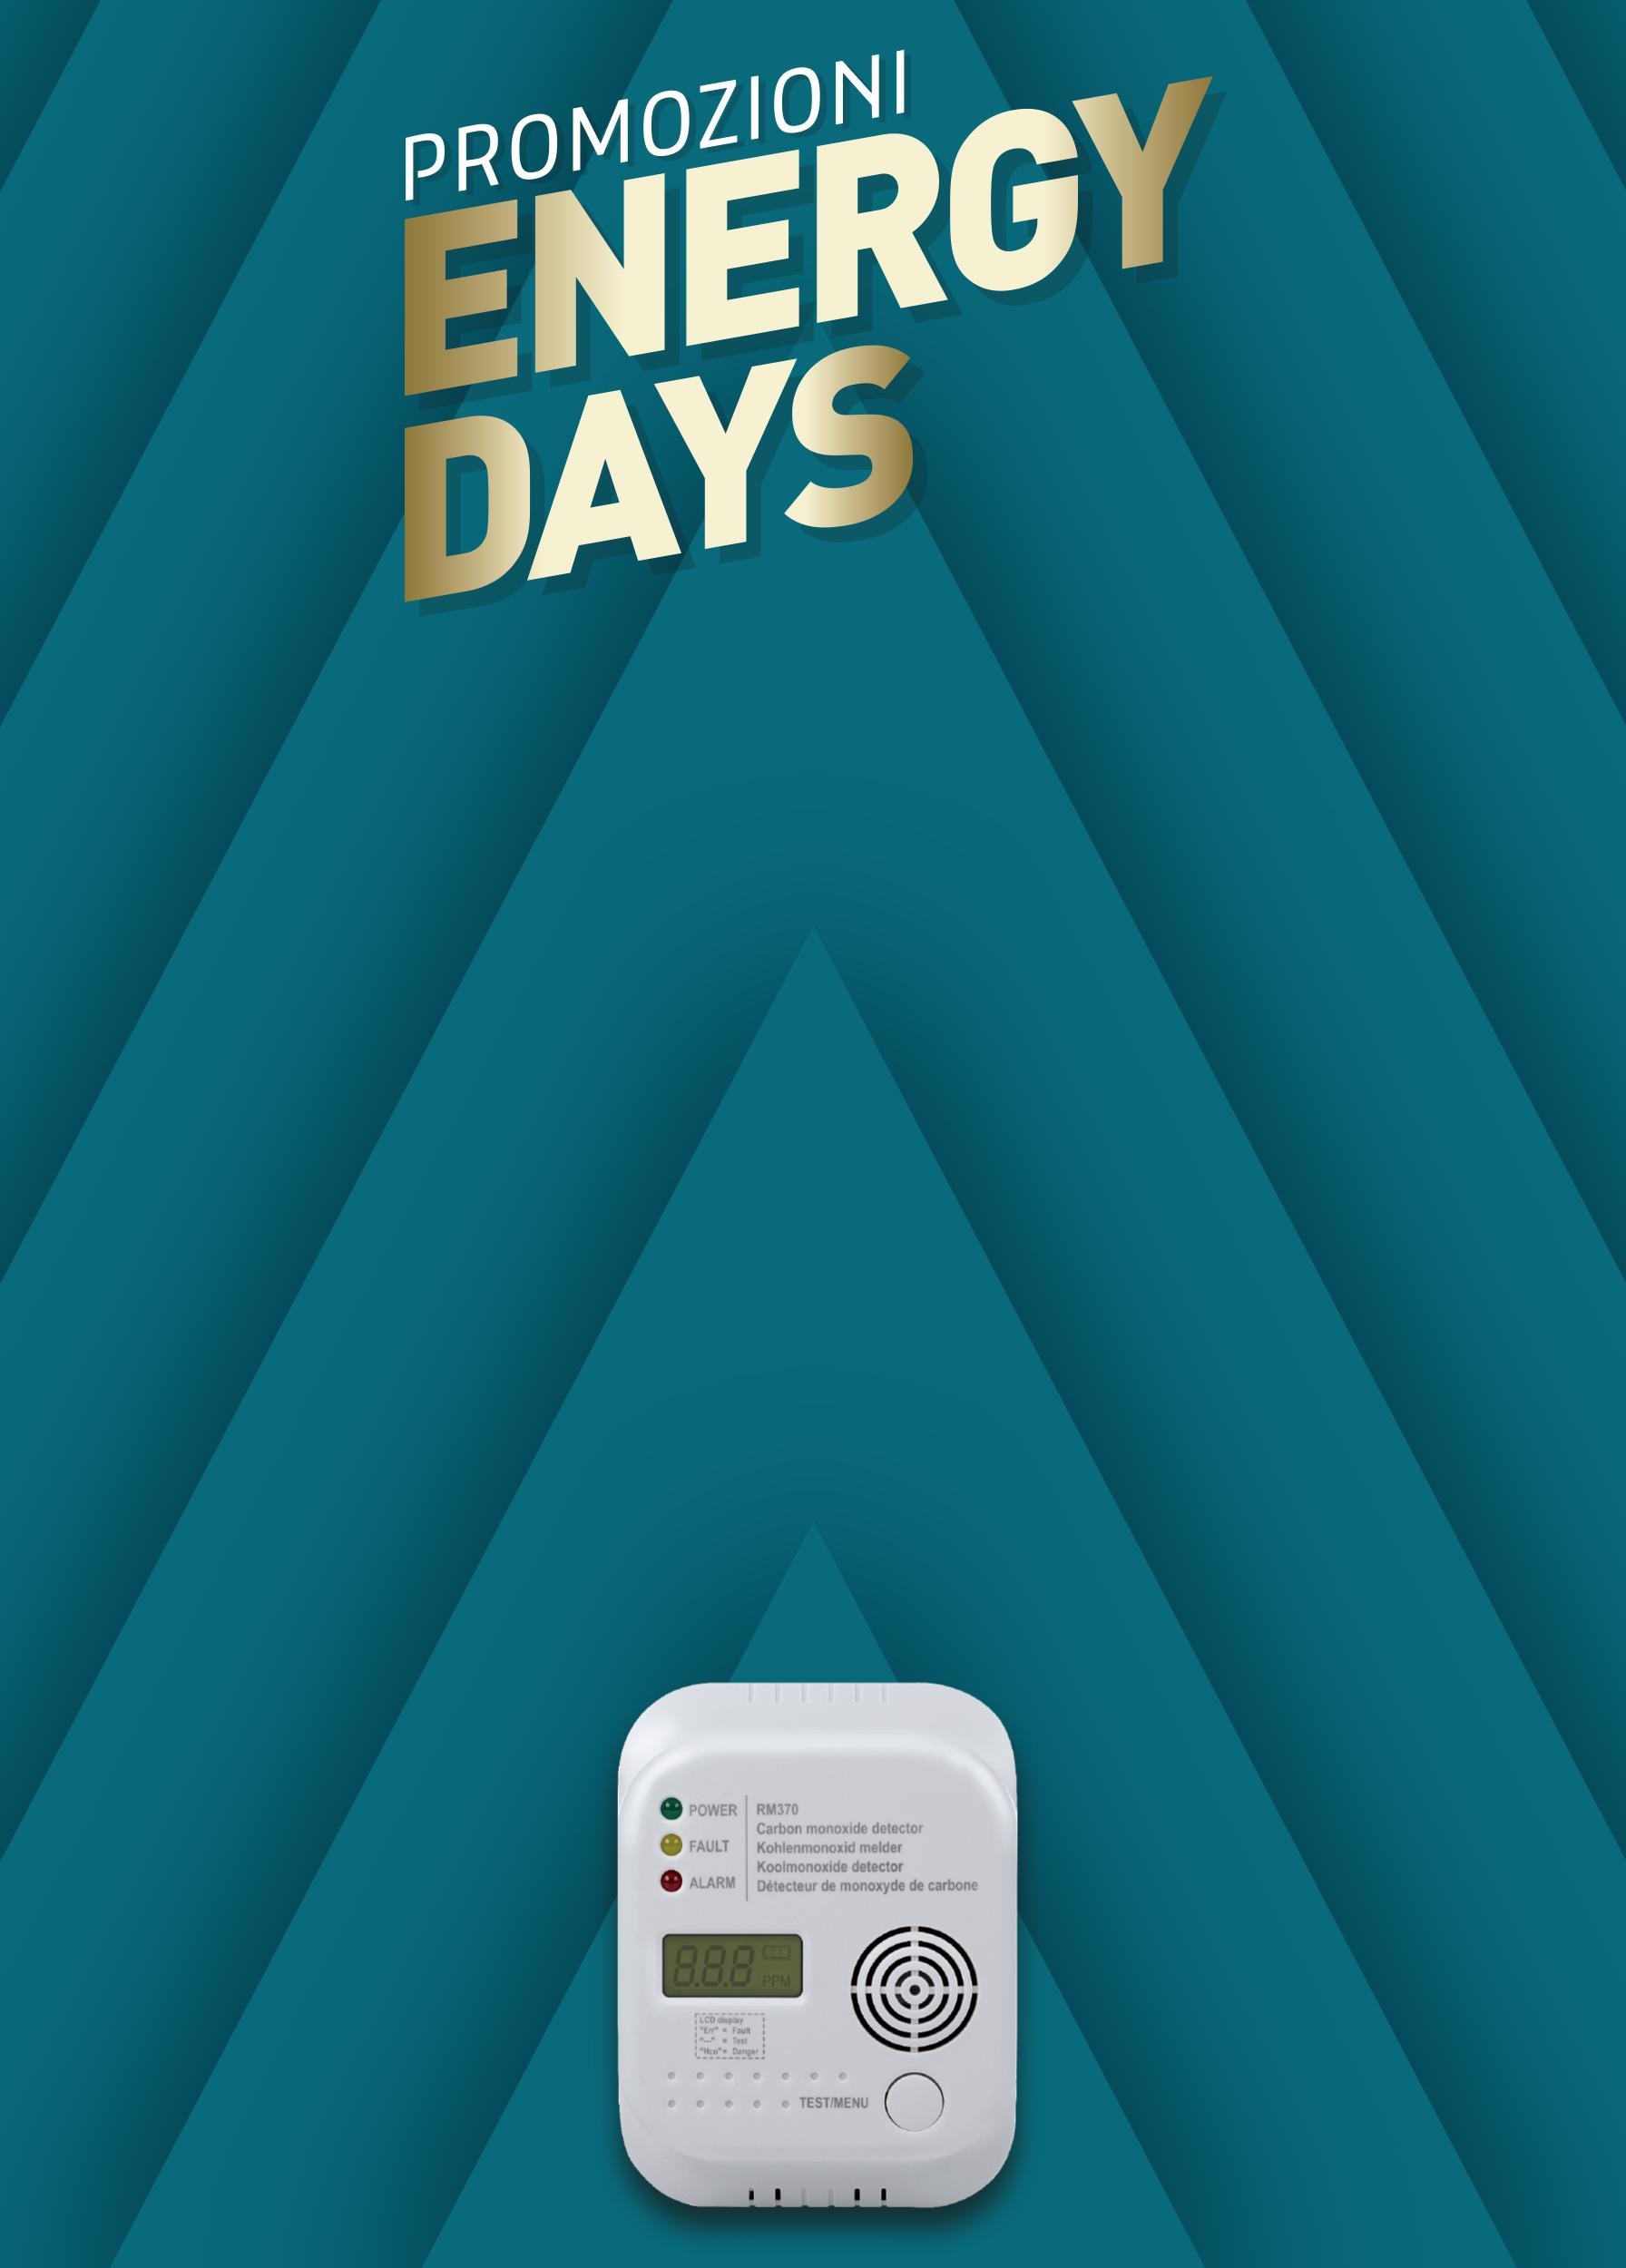 Energy days monossido mobile